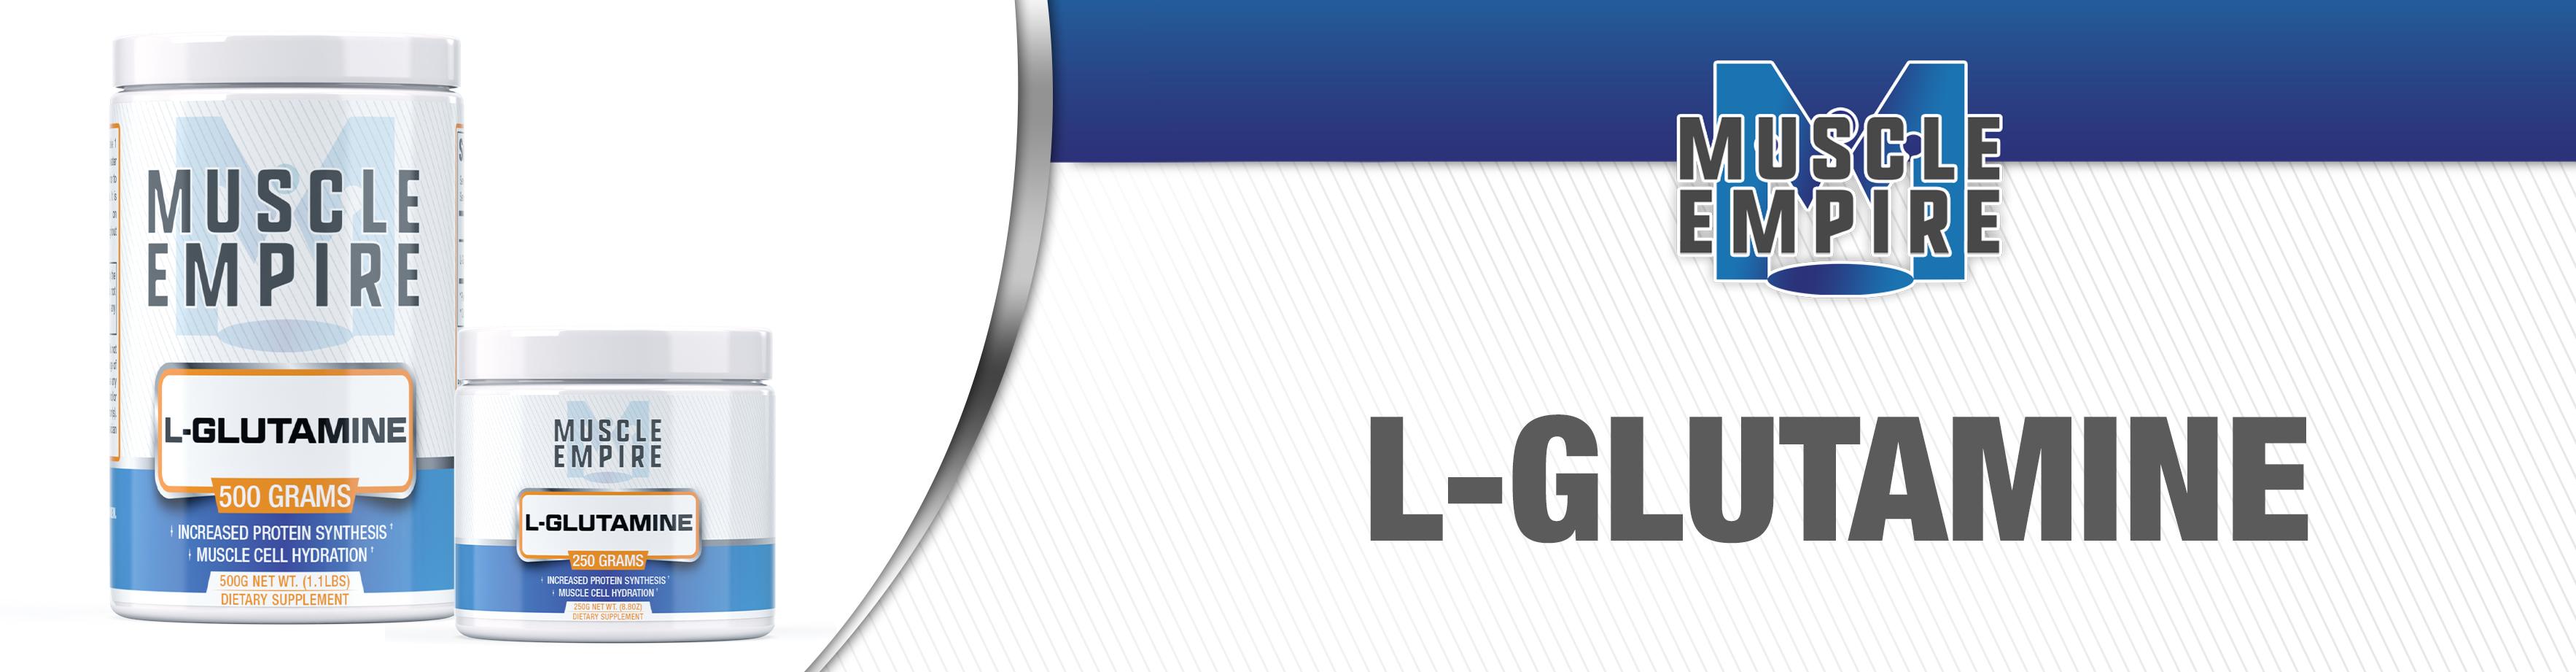 l-glutamine-powder2-10-21.jpg